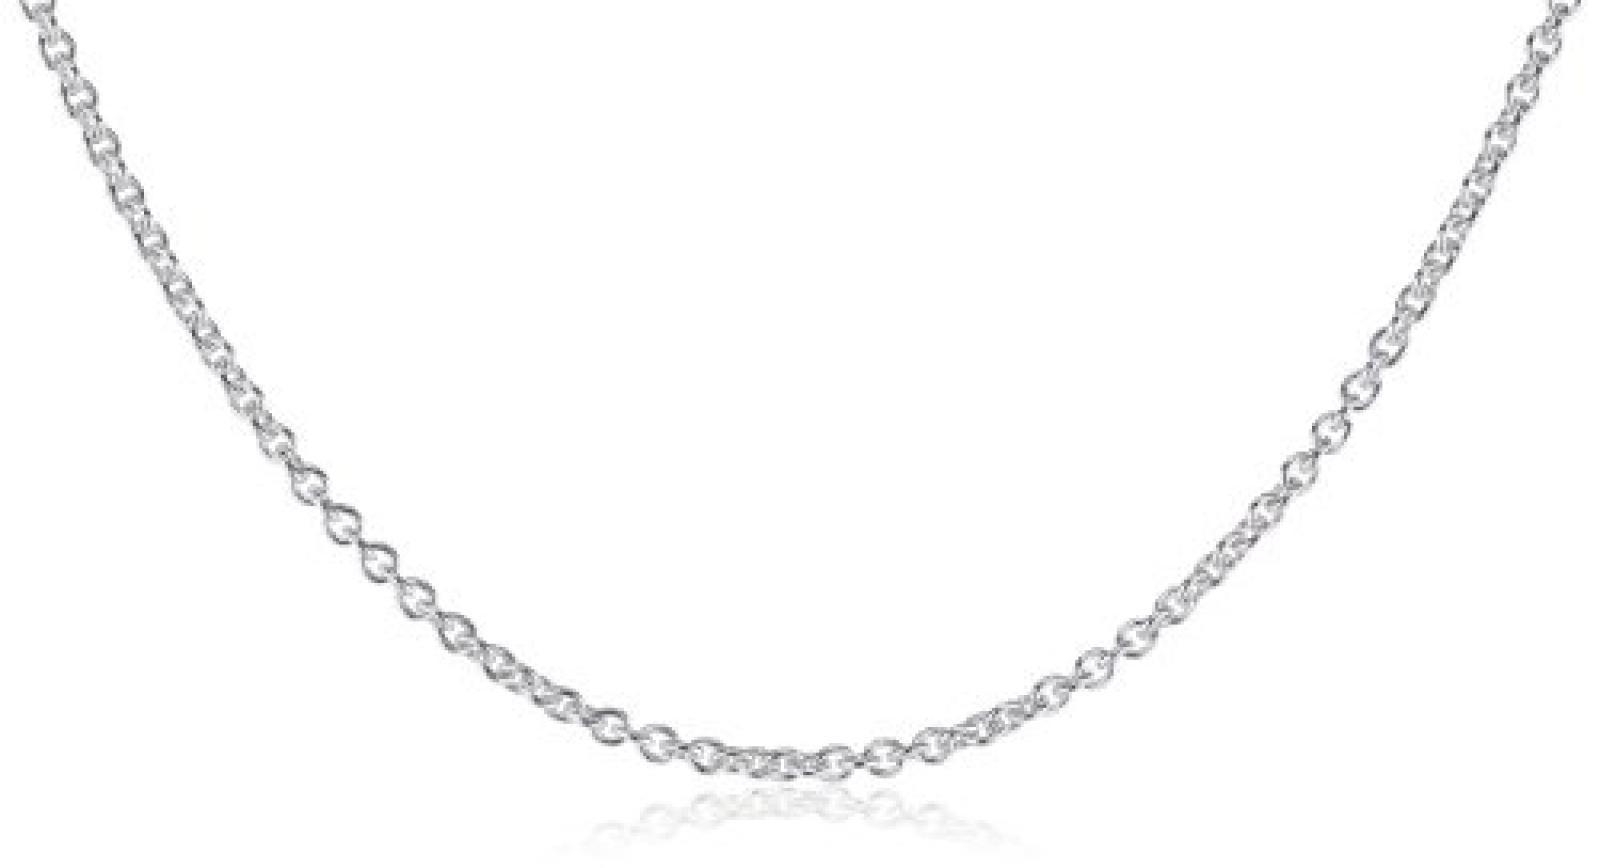 BOB C. Damen-Halskette ohne Anhänger Anker 925 Sterling Silber 326994